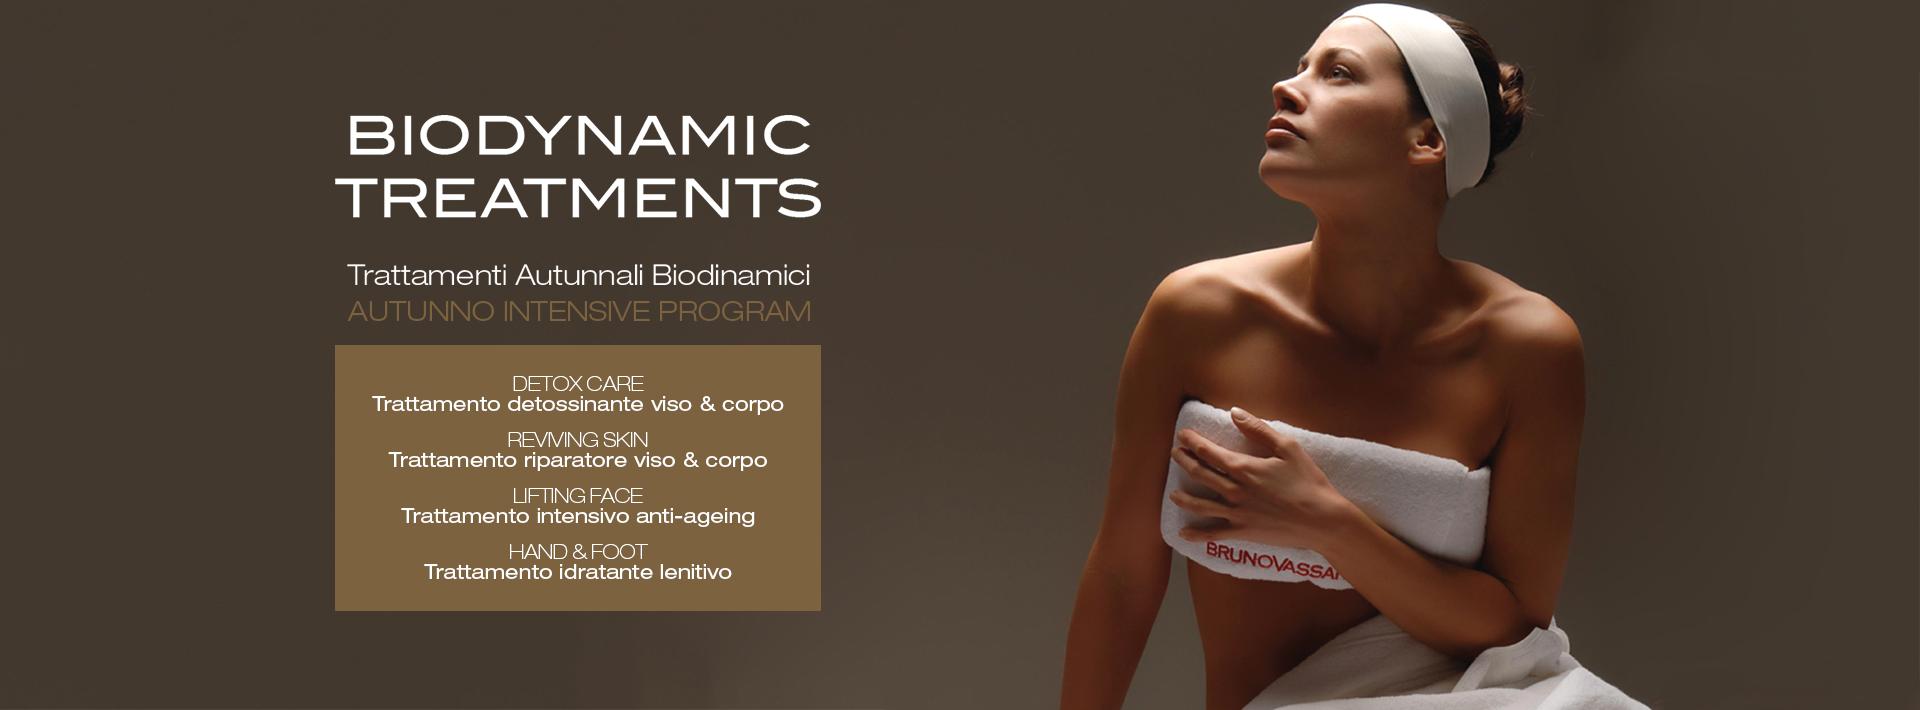 BIODYNAMIC TREATMENT2